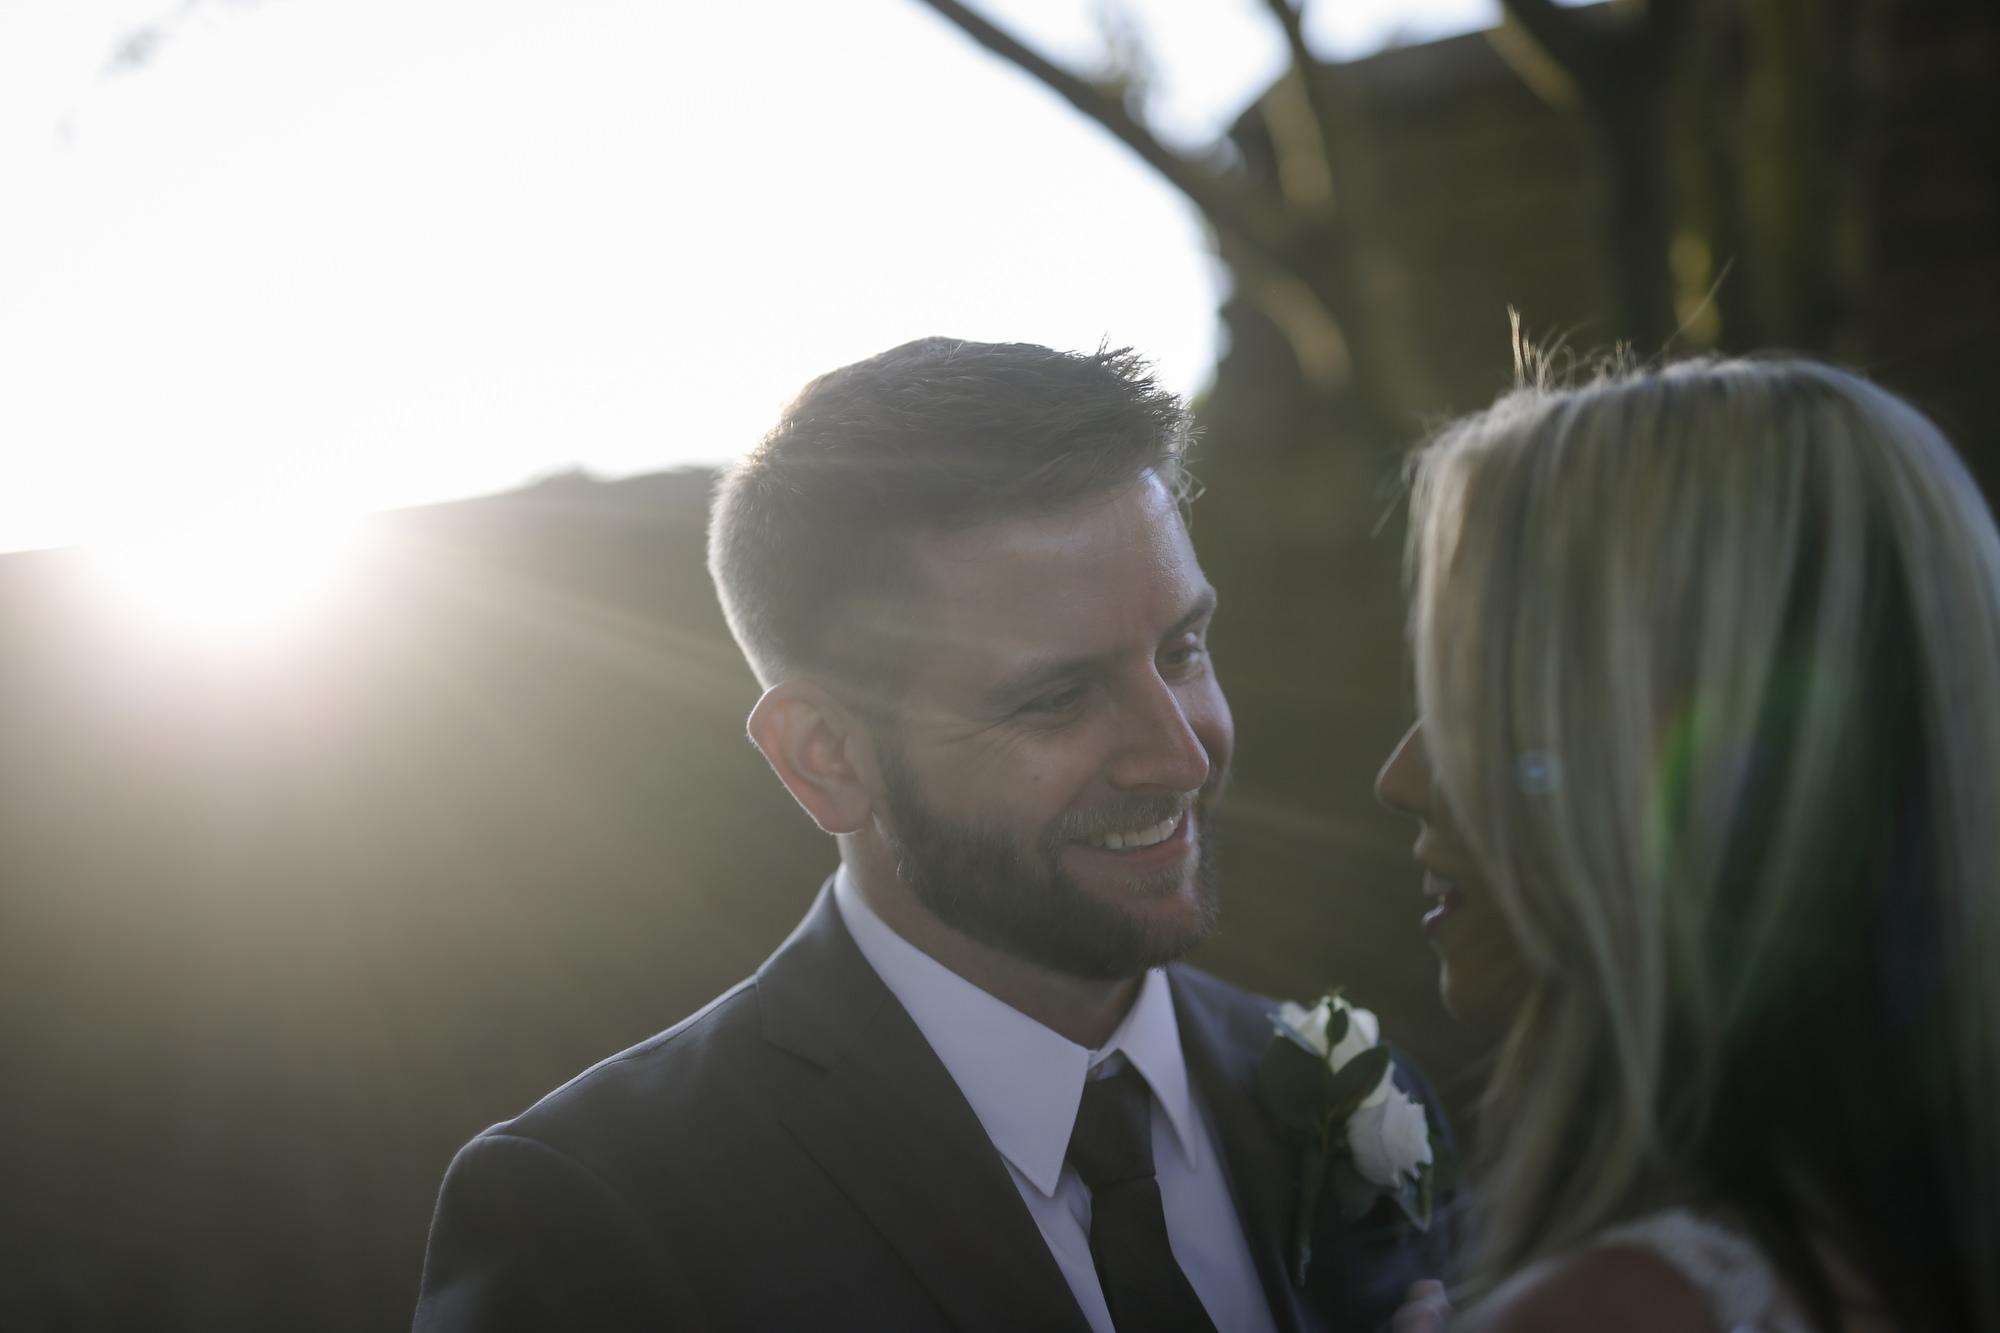 kilkea_castle_wedding_photographer_goldenmoments_060.jpg